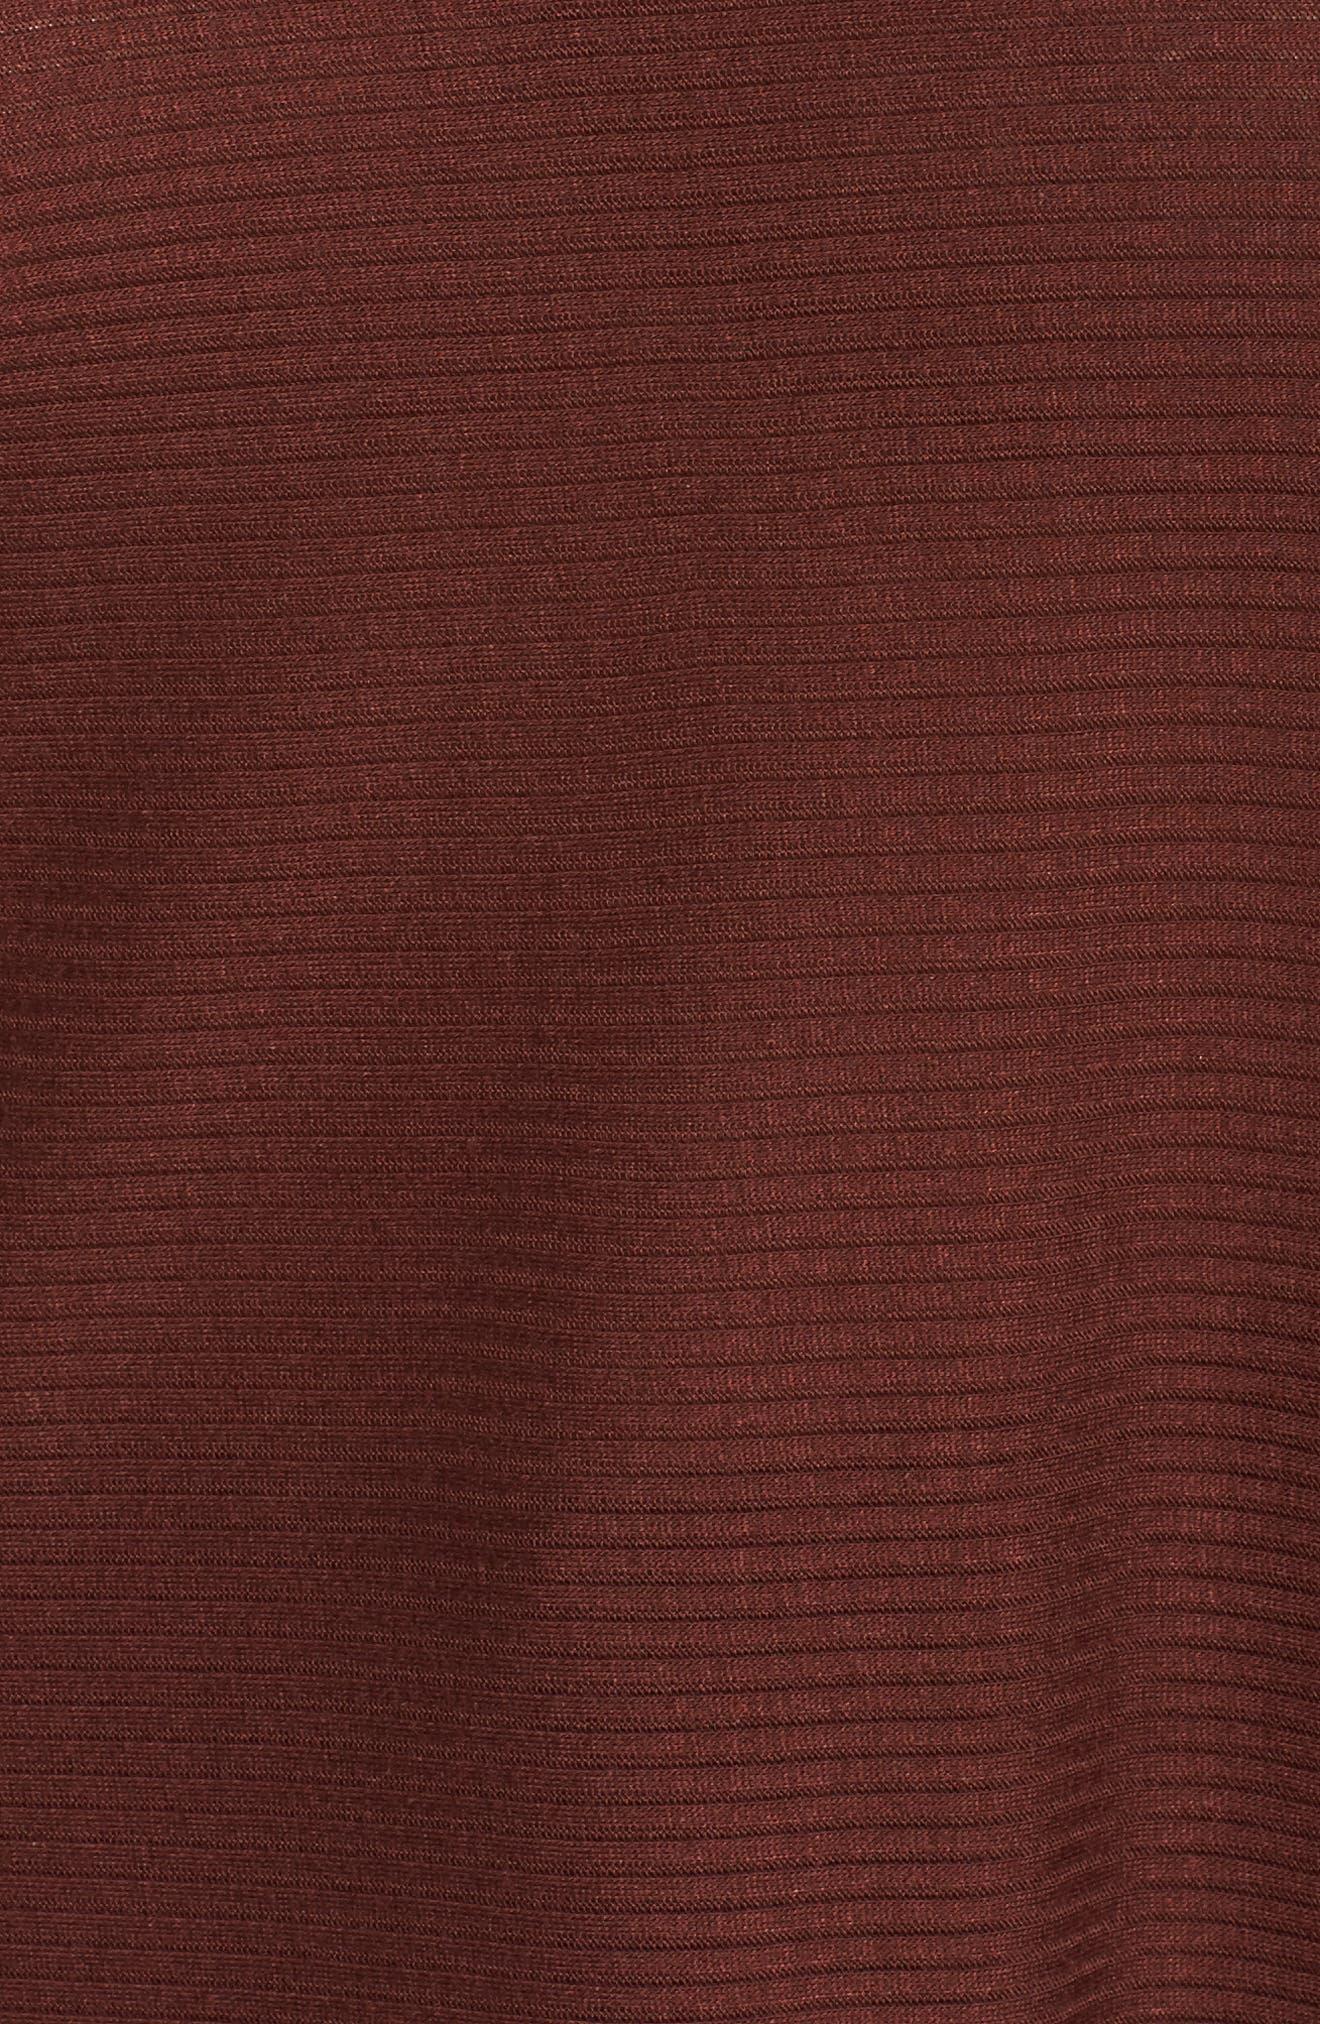 Mock Neck Rib Knit Top,                             Alternate thumbnail 5, color,                             Rum Raisin